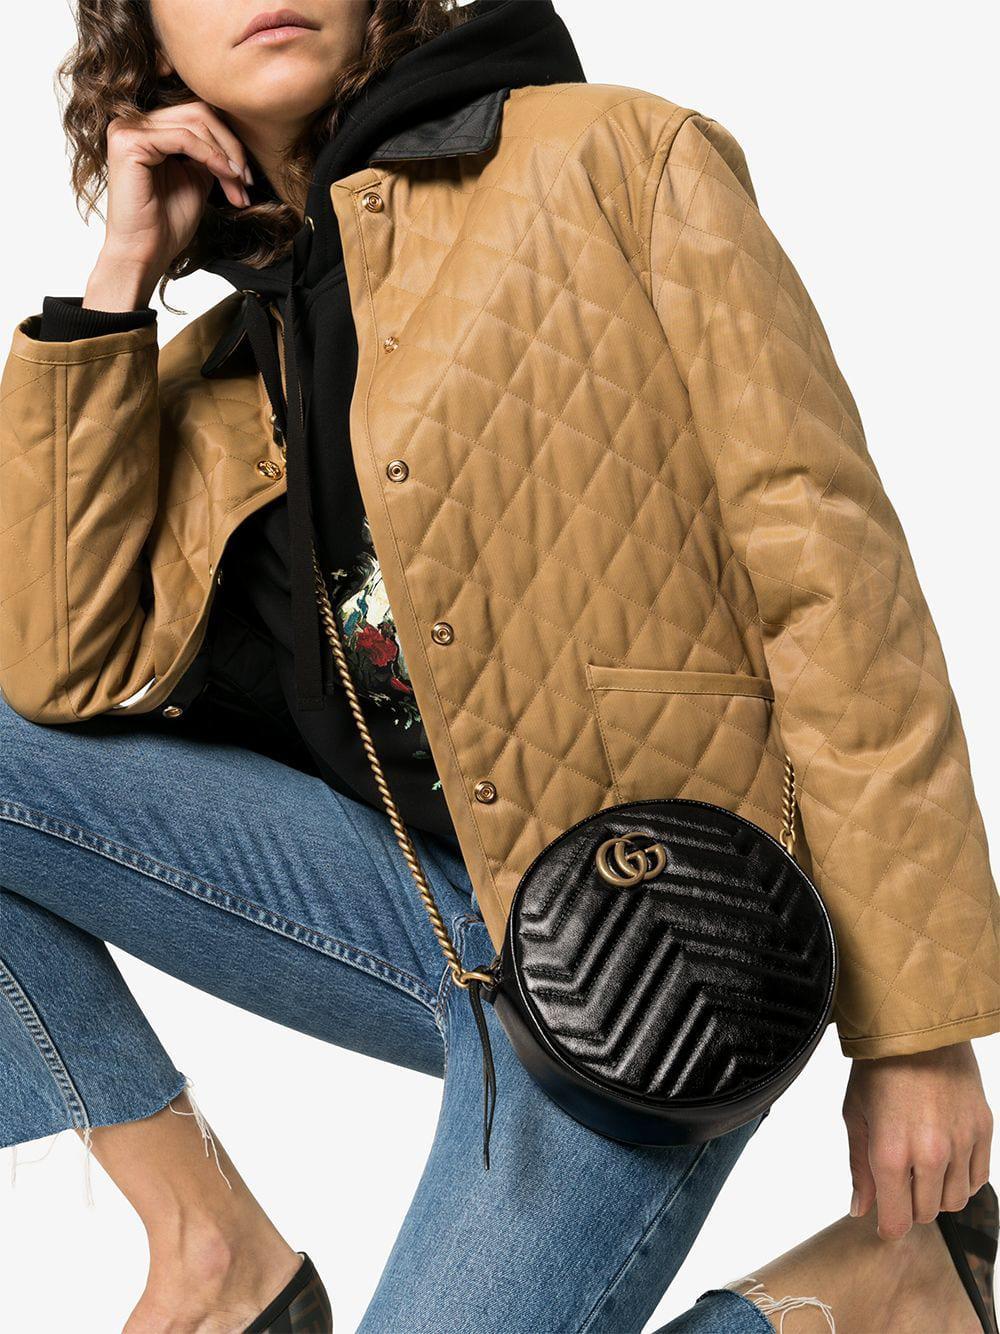 2c118096e7a87 Gucci - Black GG Marmont Mini Round Shoulder Bag - Lyst. View fullscreen